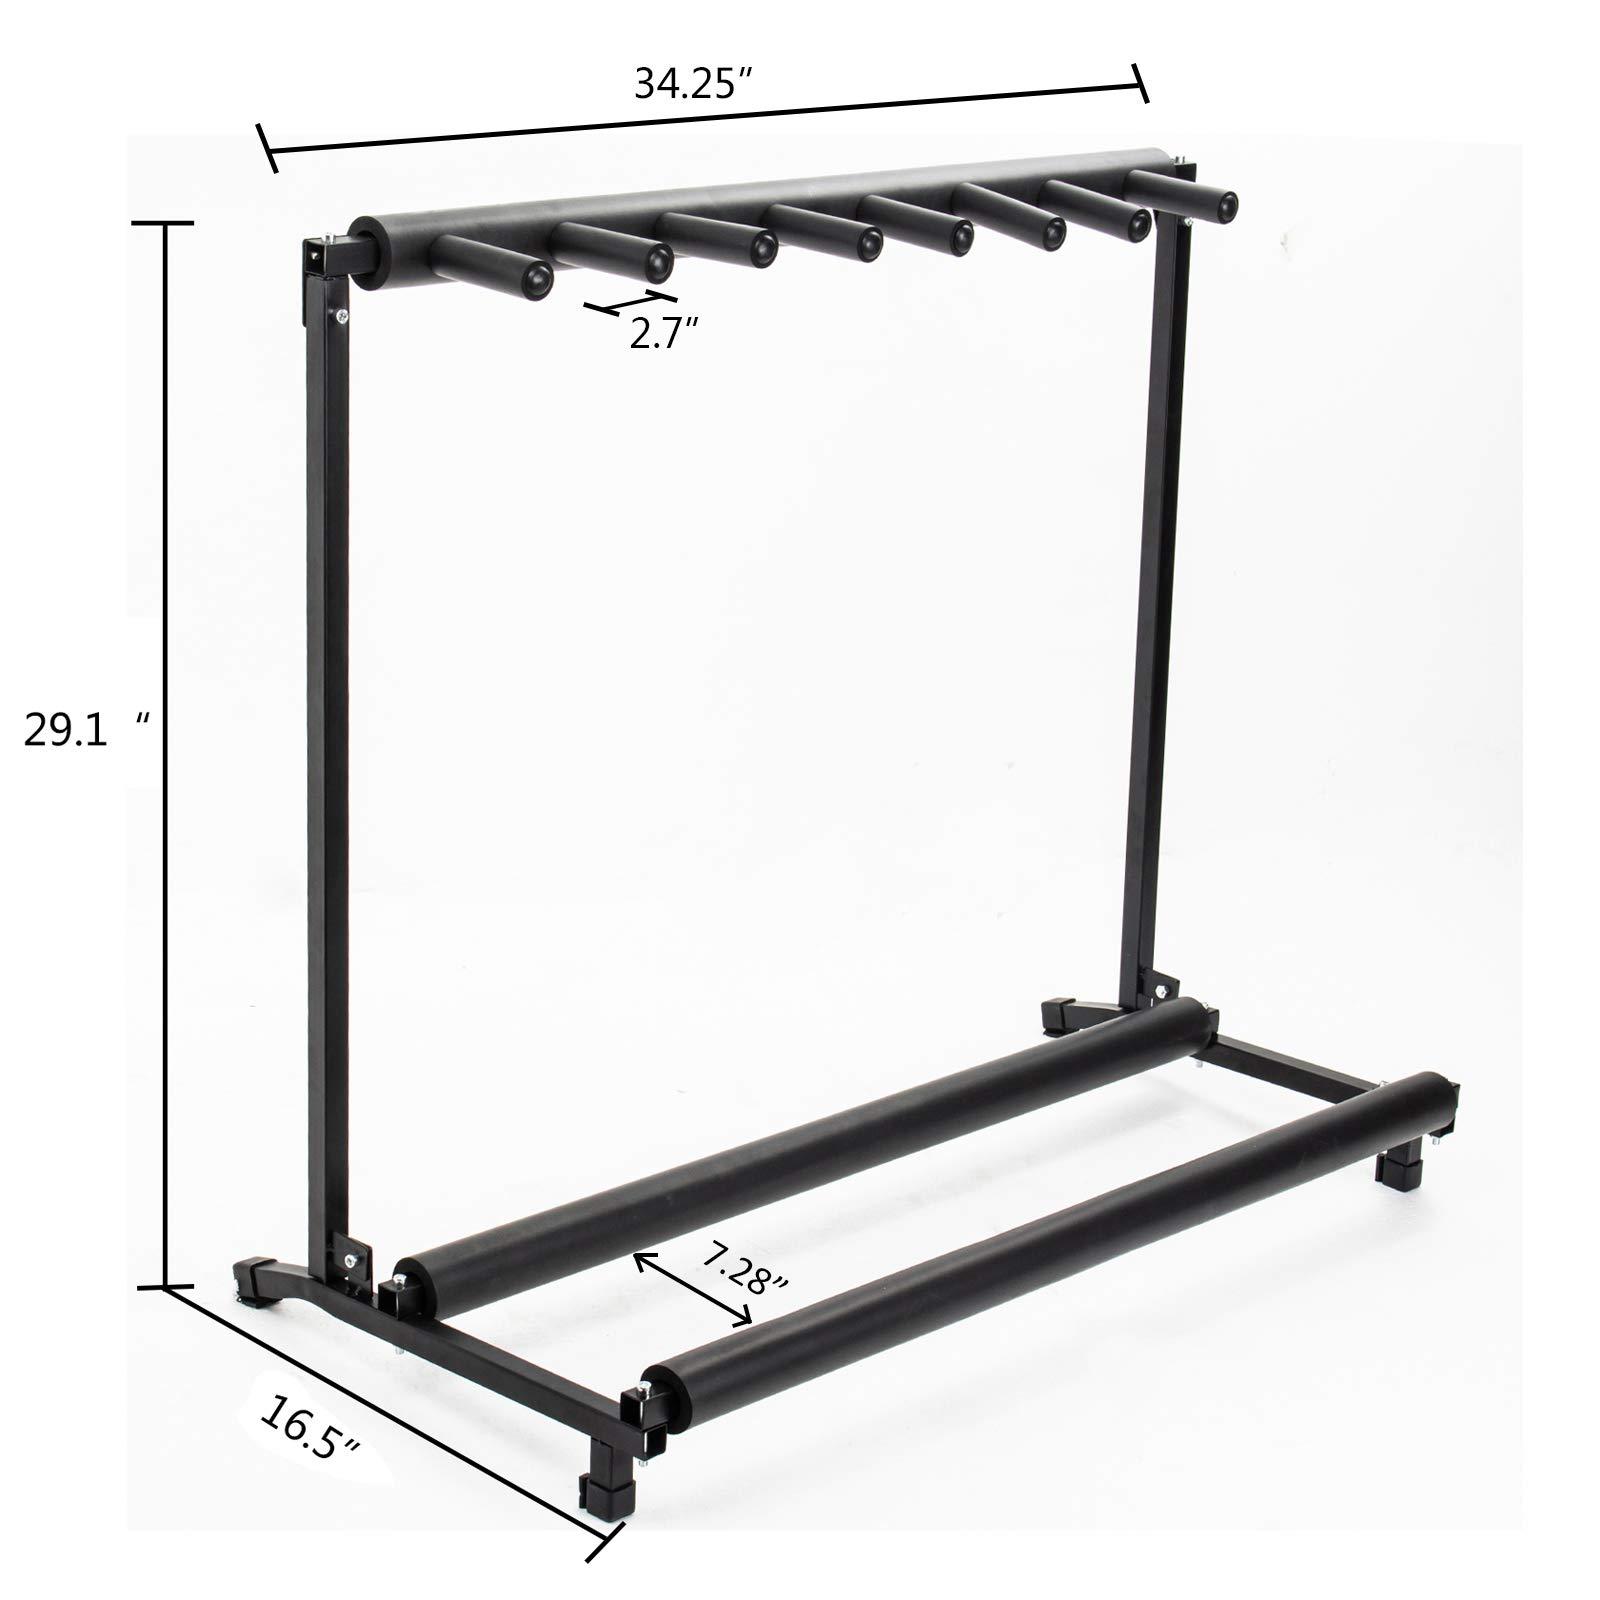 AJO Multi Guitar Stand,7 Holder Guitar Folding Portable Storage Organization Stand Display Rack,Black by AJO (Image #3)